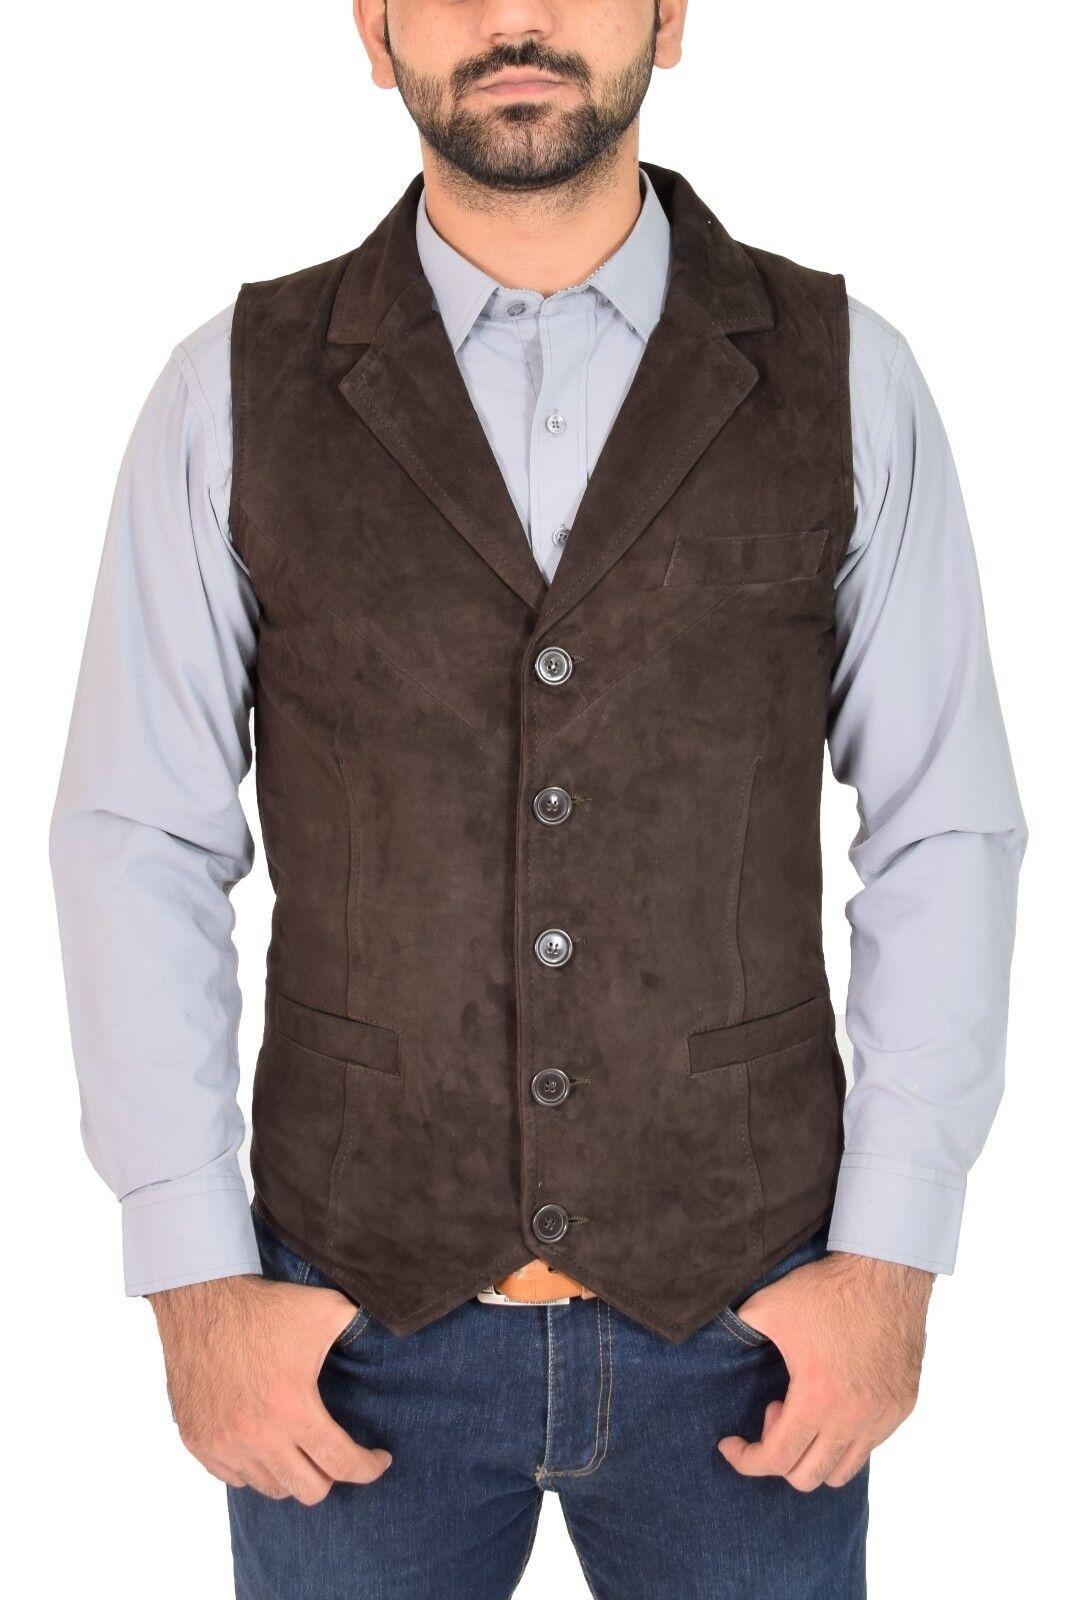 Mens Genuine Brown Suede Waistcoat Soft Leather Gilet Classic Western Vest Yelek